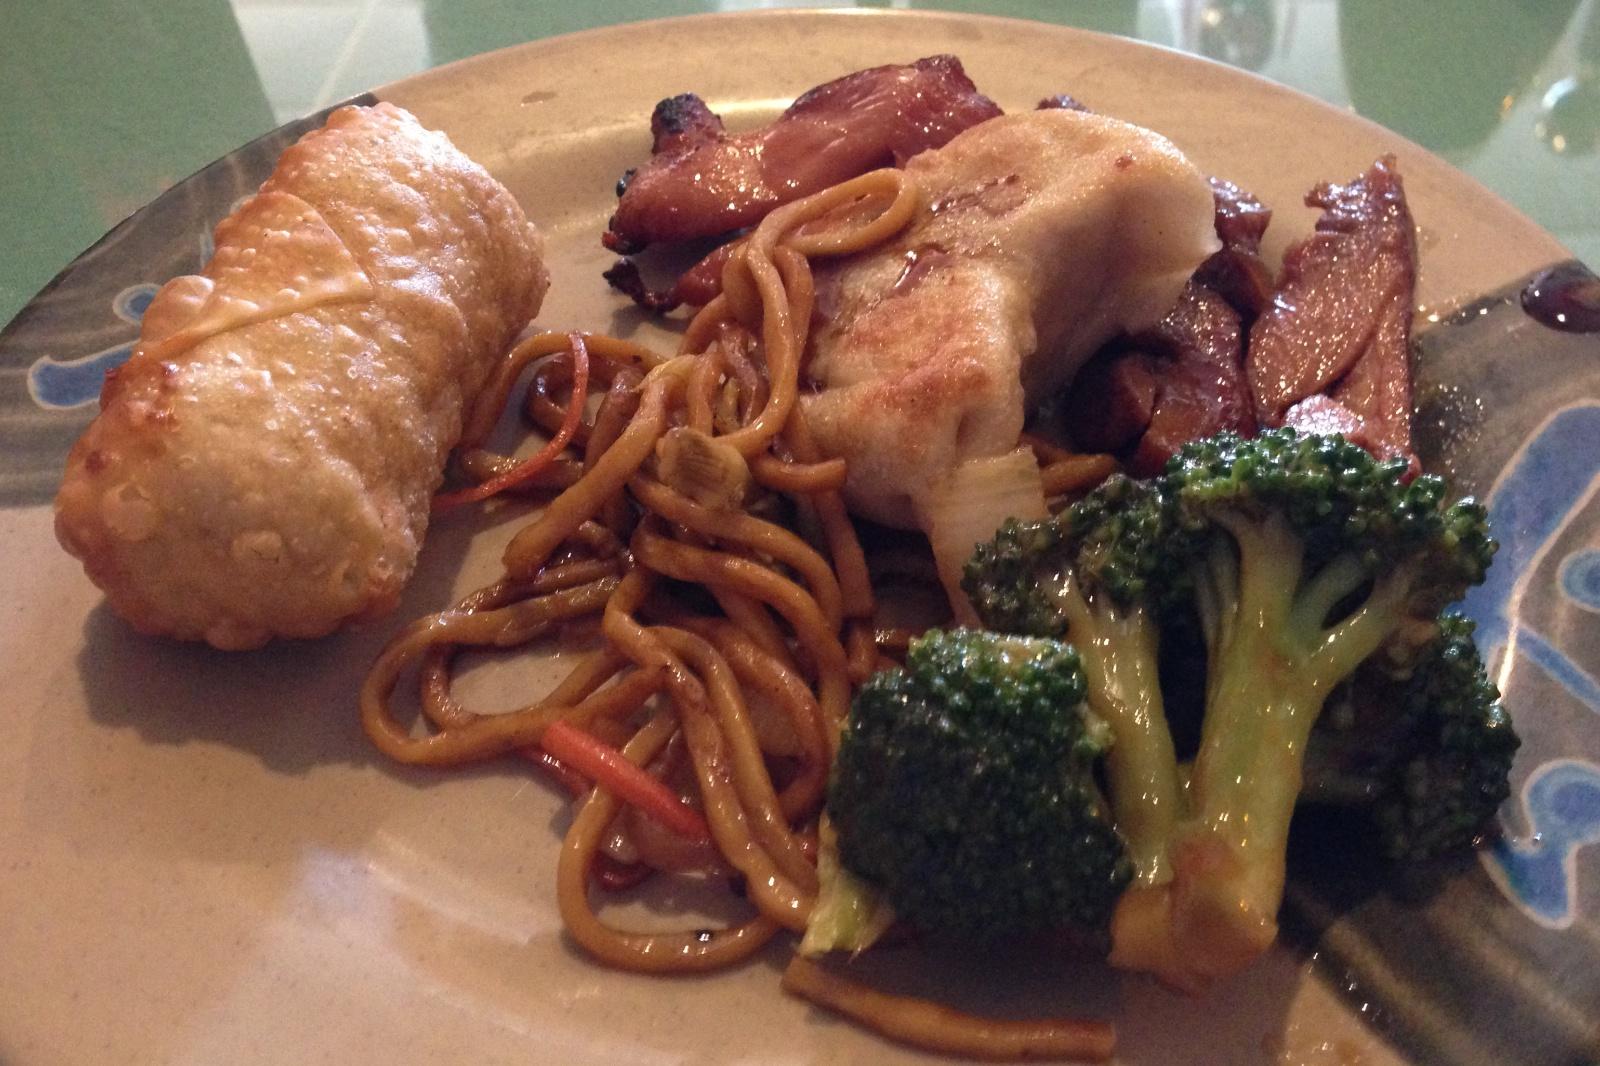 http://blog.rickk.com/food/2013/08/11/ate.2013.08.11.d1.jpg